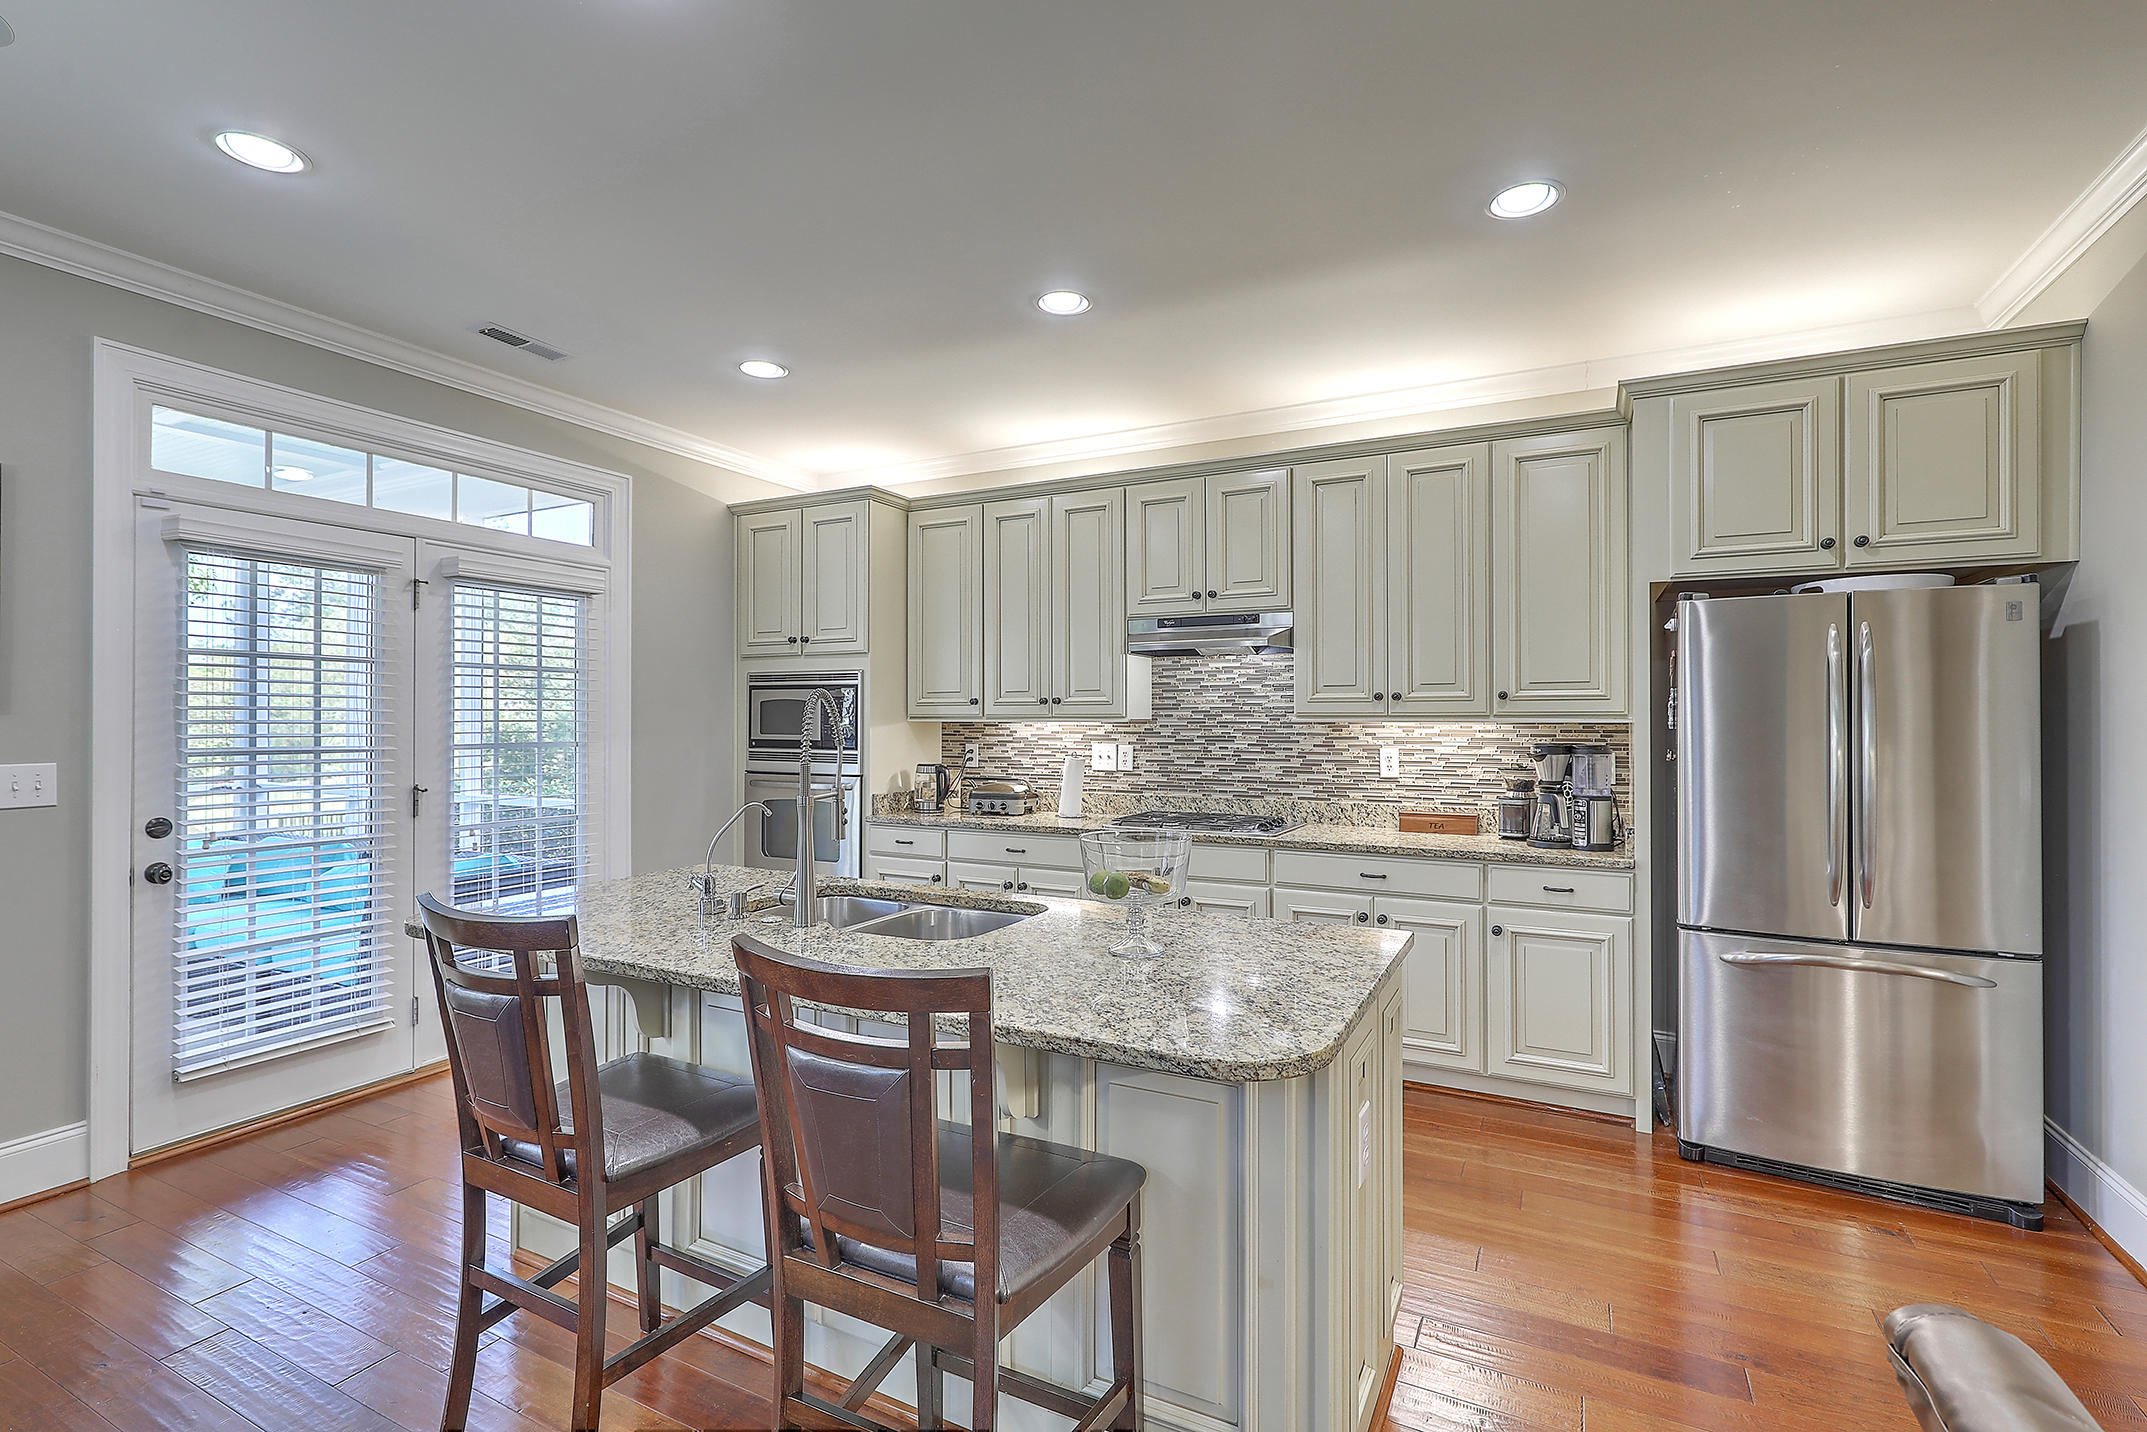 Branch Creek Homes For Sale - 304 Pond Hill, Summerville, SC - 10